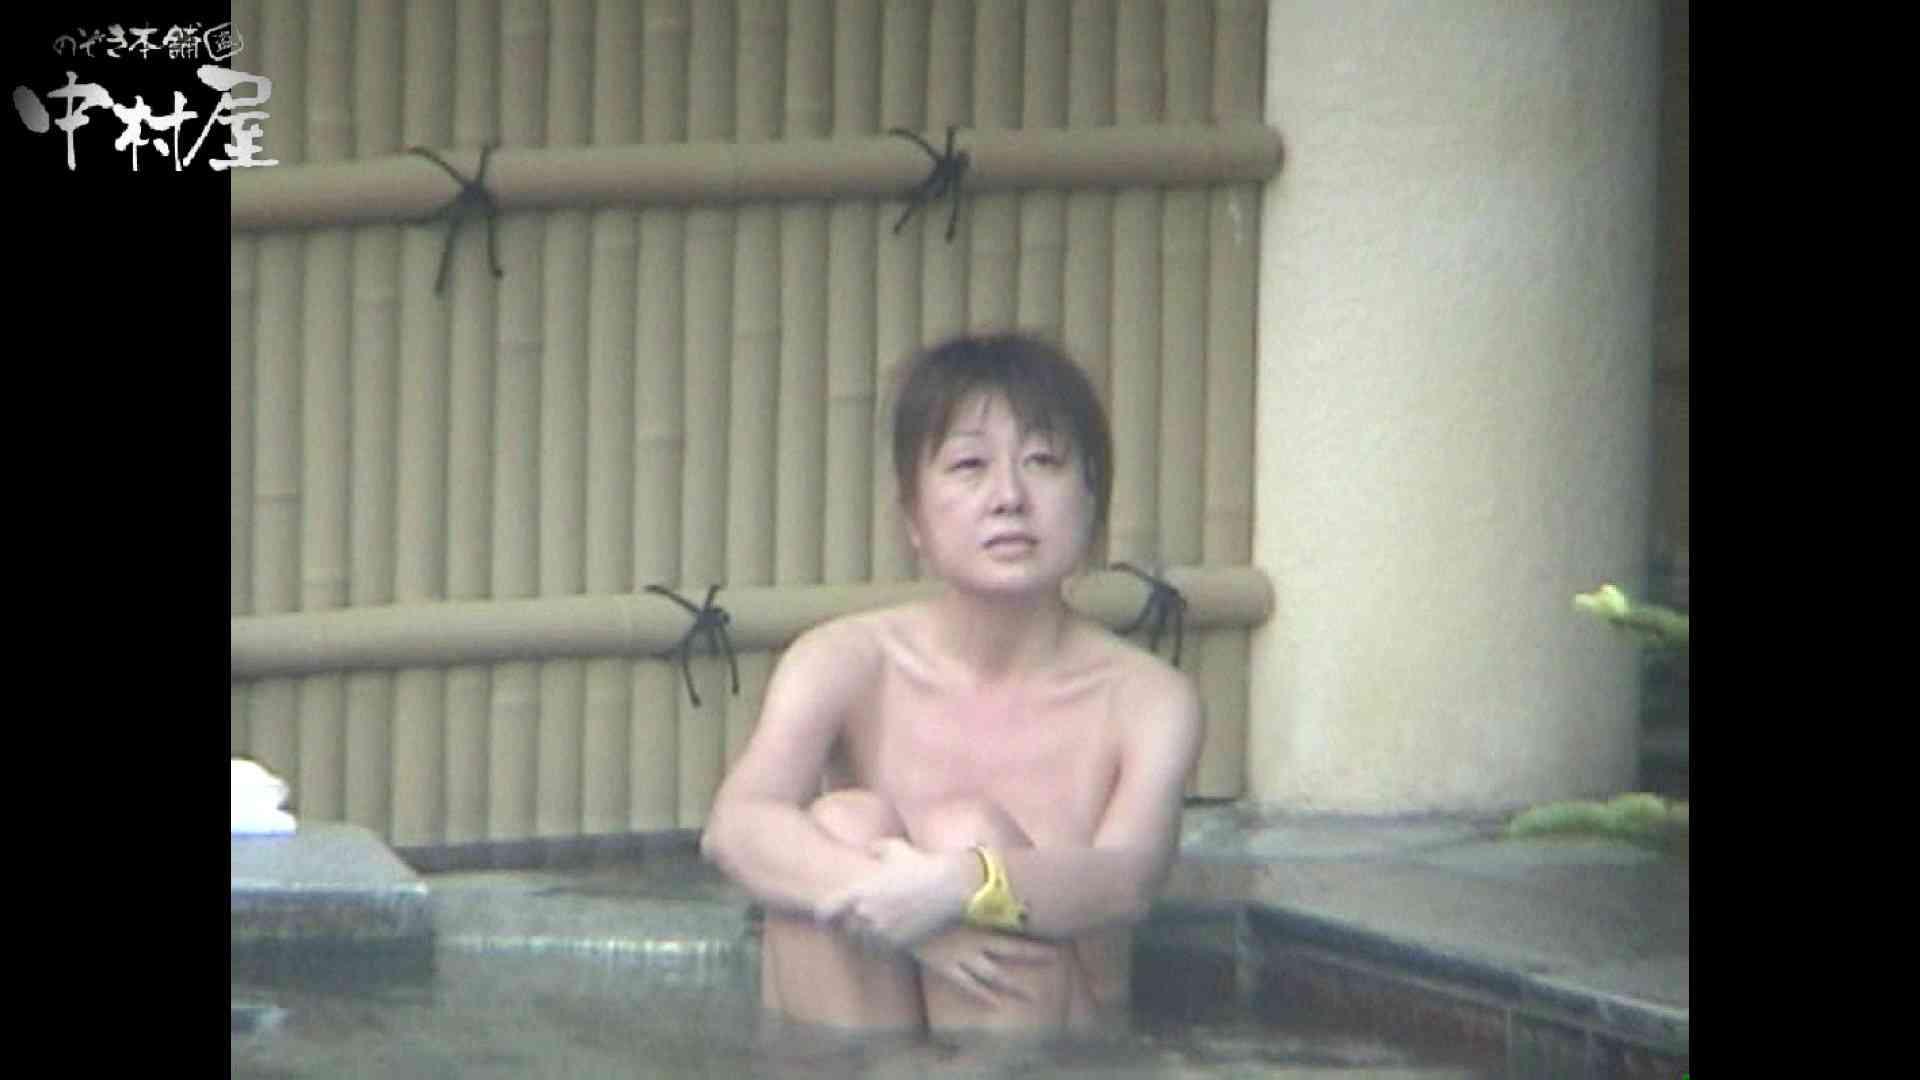 Aquaな露天風呂Vol.958 露天 オメコ無修正動画無料 82枚 23